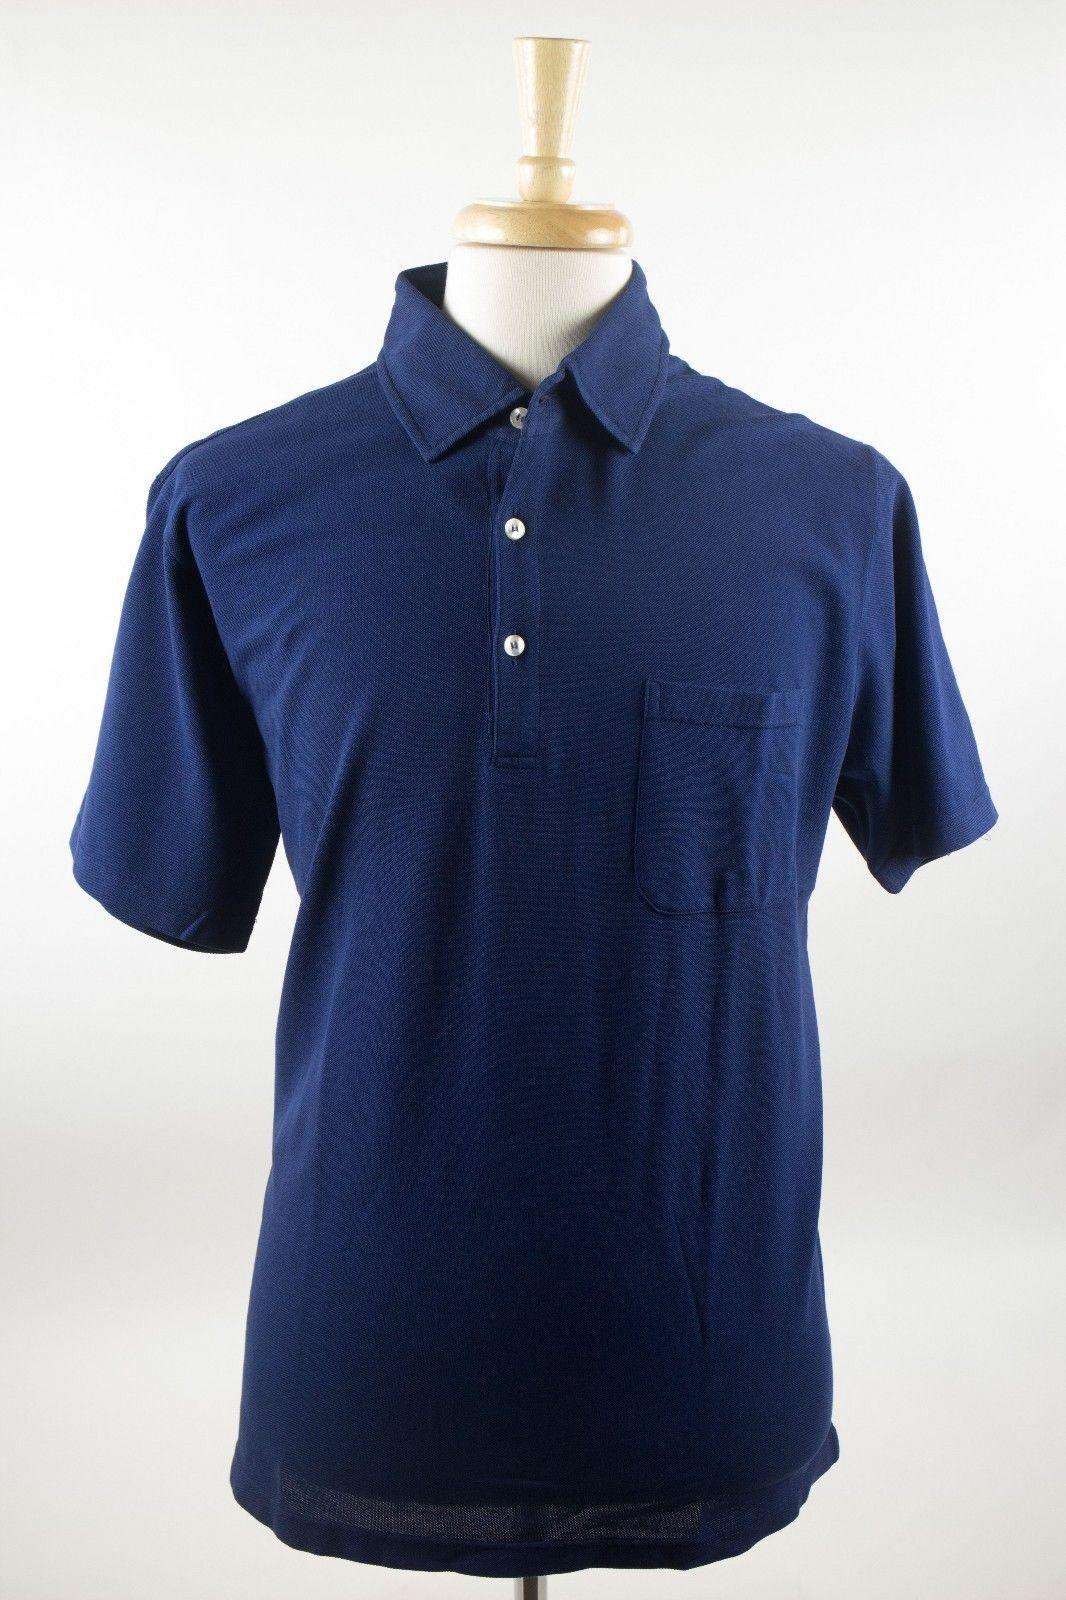 NWT Davide Cenci Luxurious bluee 100% Cotton Casual Polo Shirt 46 56